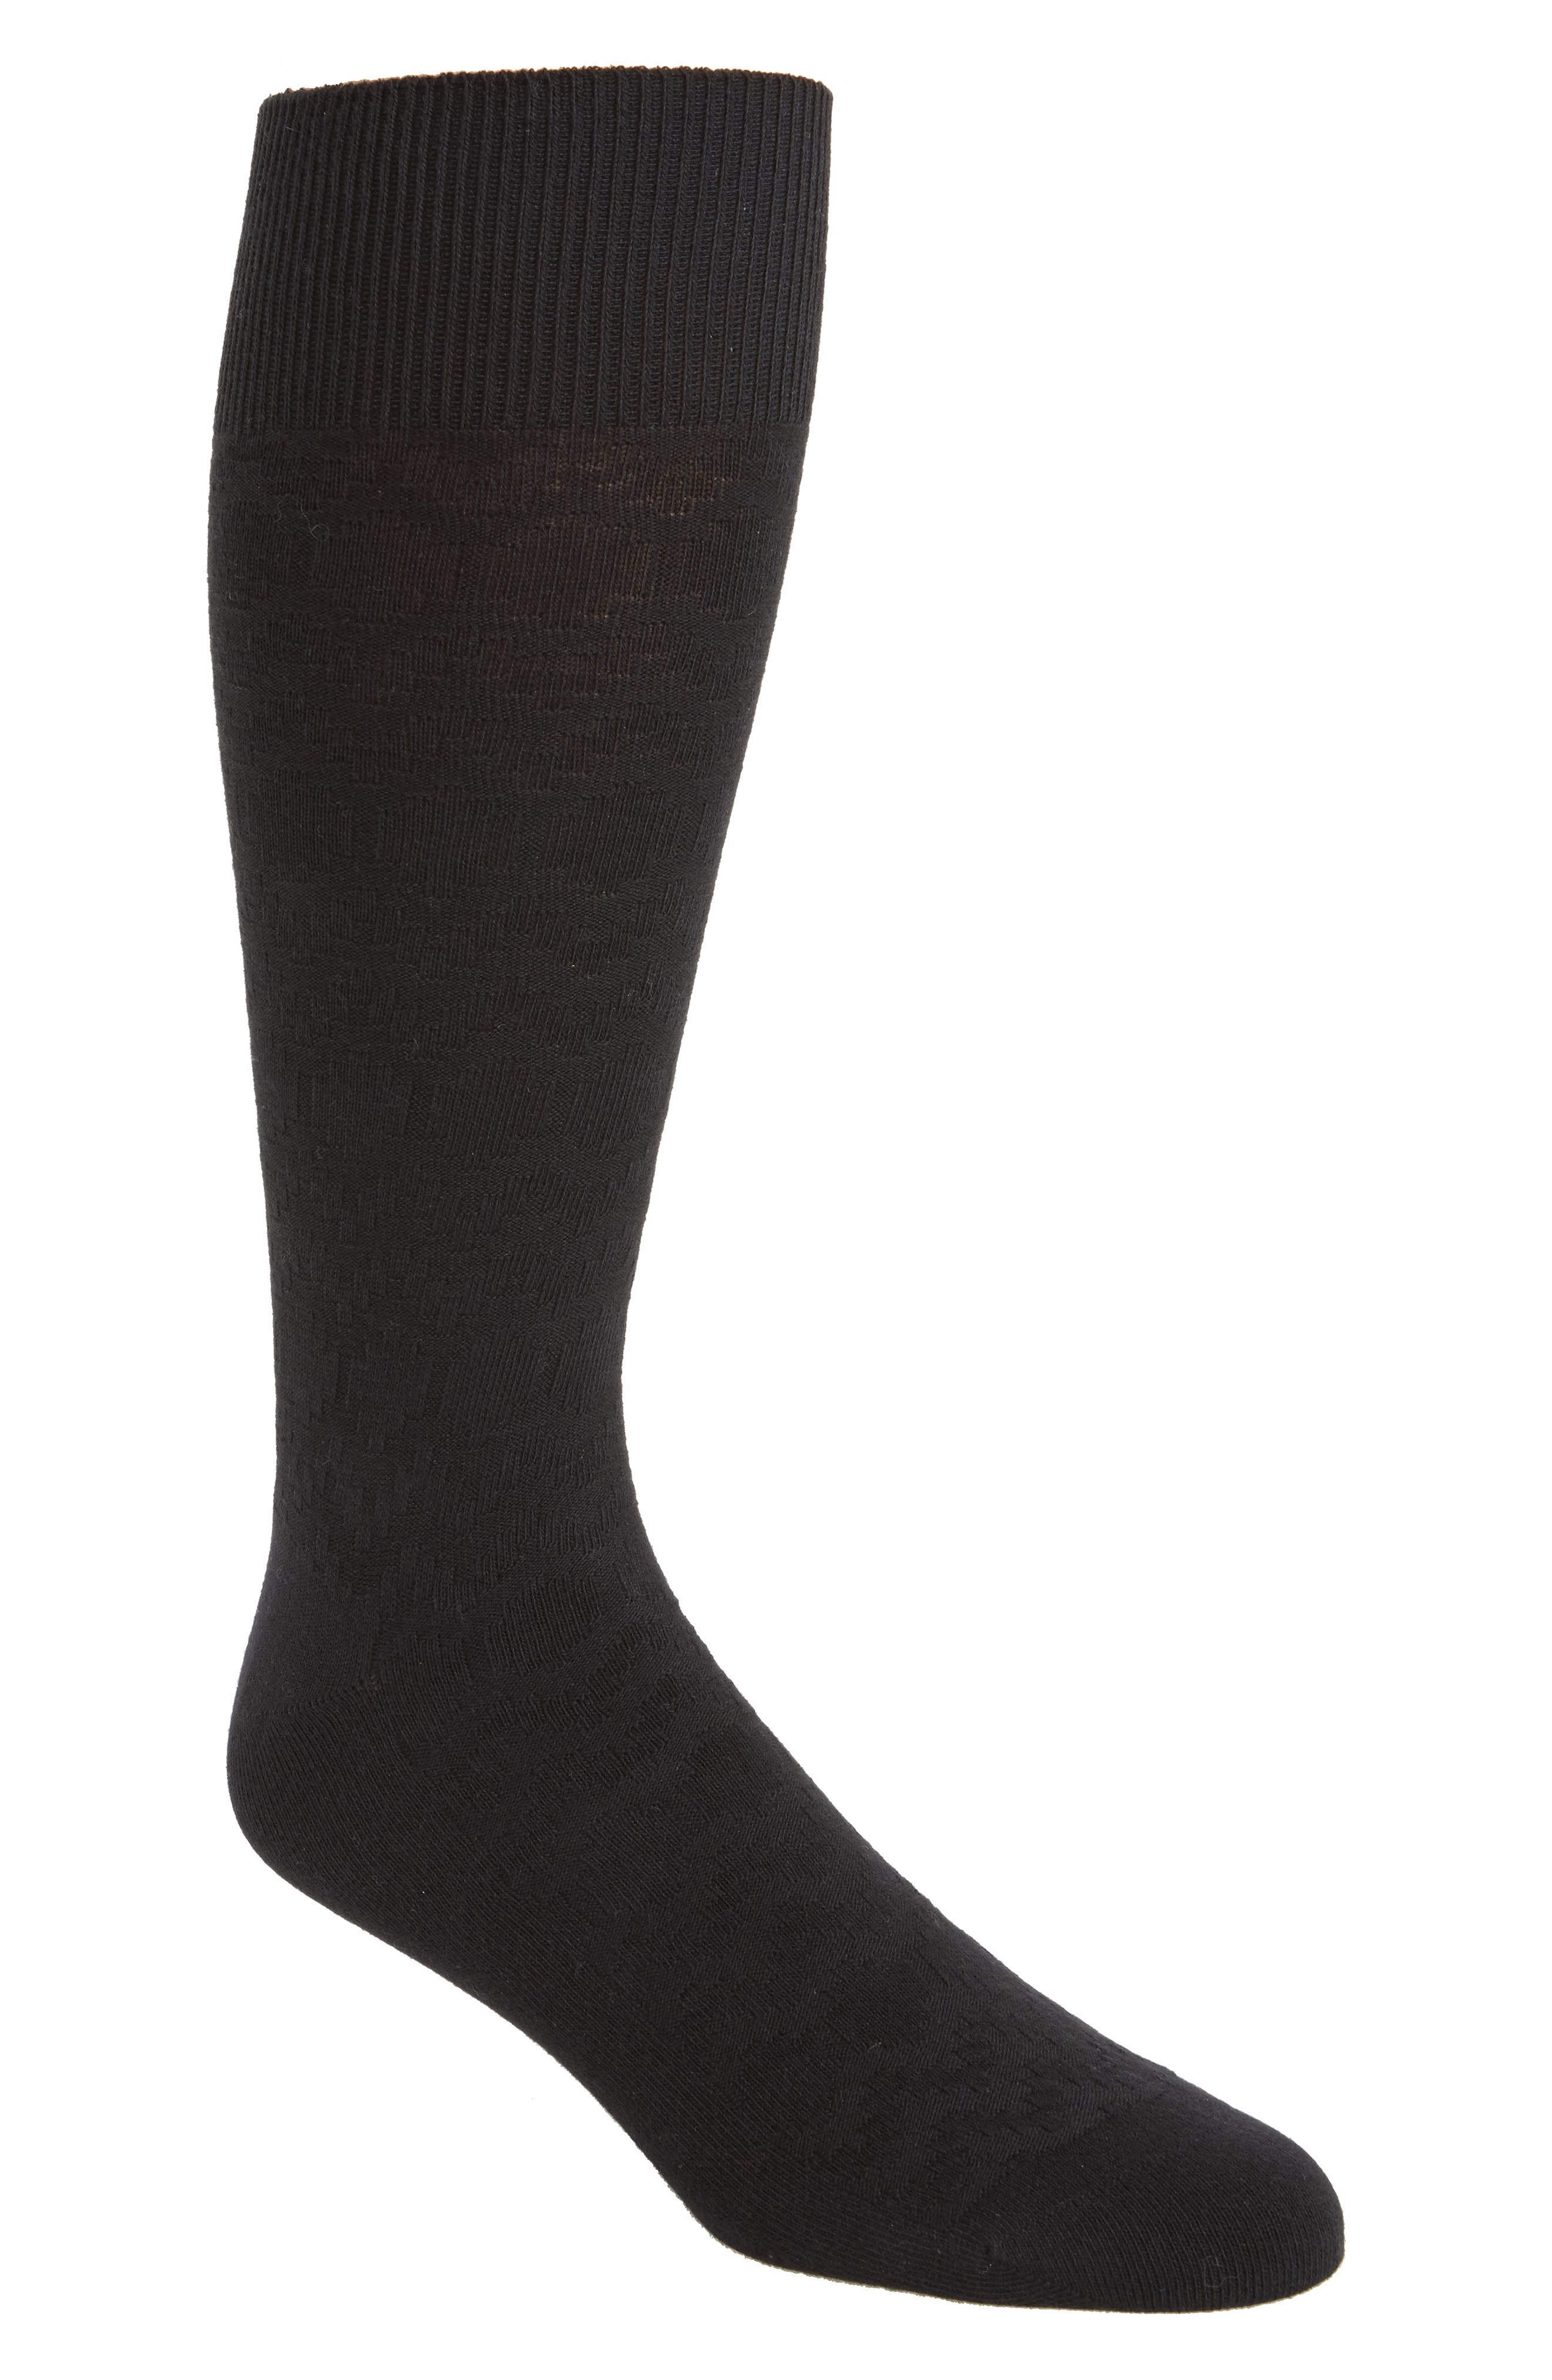 Rug Stripe Texture Socks,                             Main thumbnail 1, color,                             001